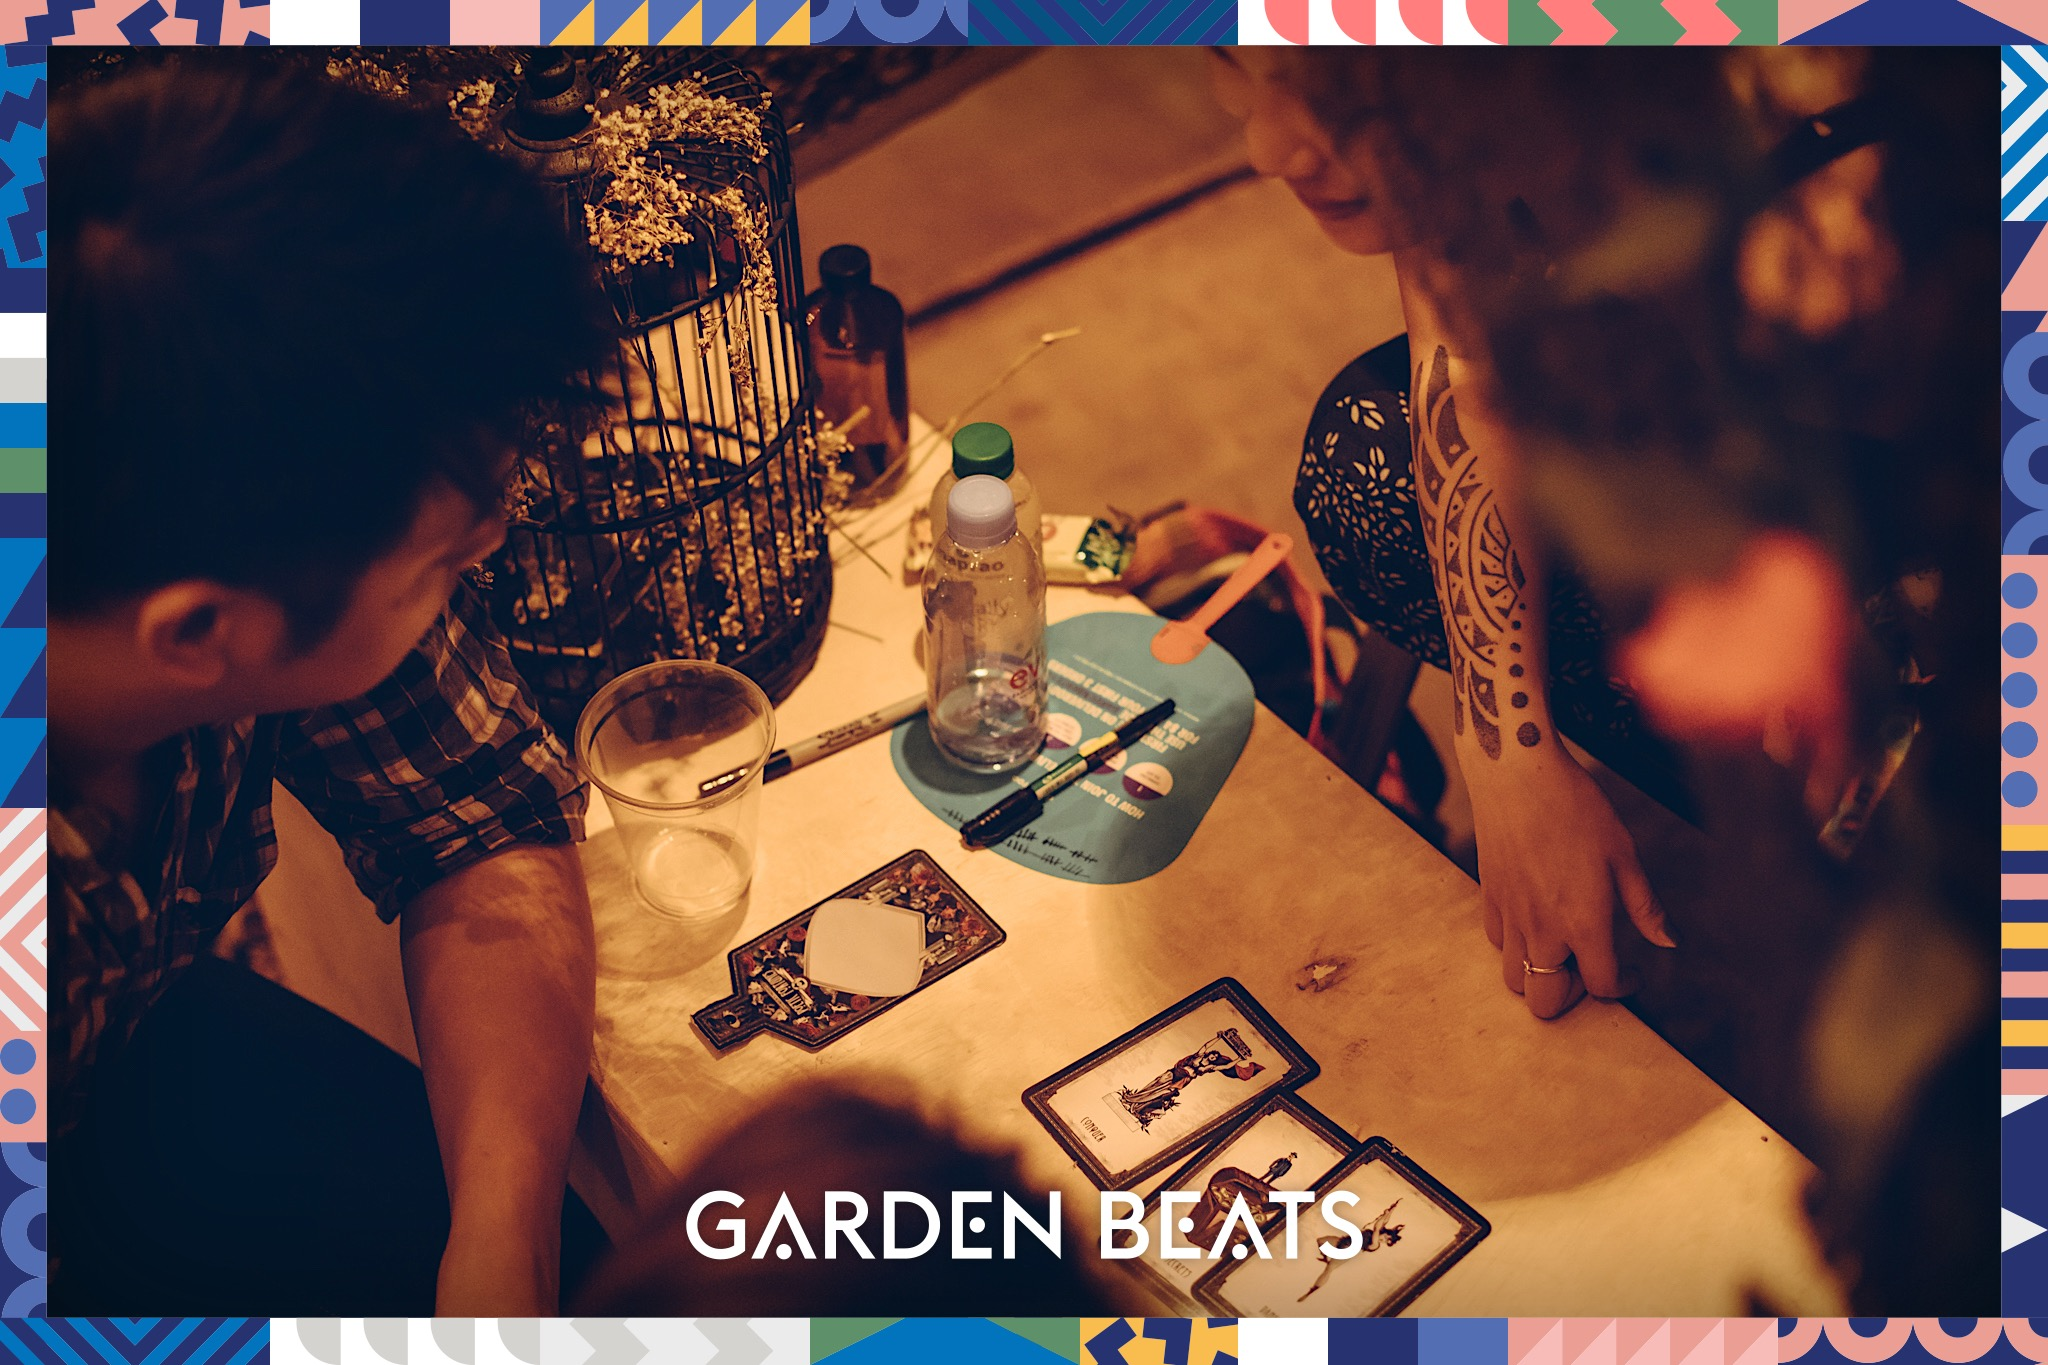 03032018_GardenBeats_Colossal895_Watermarked.jpg